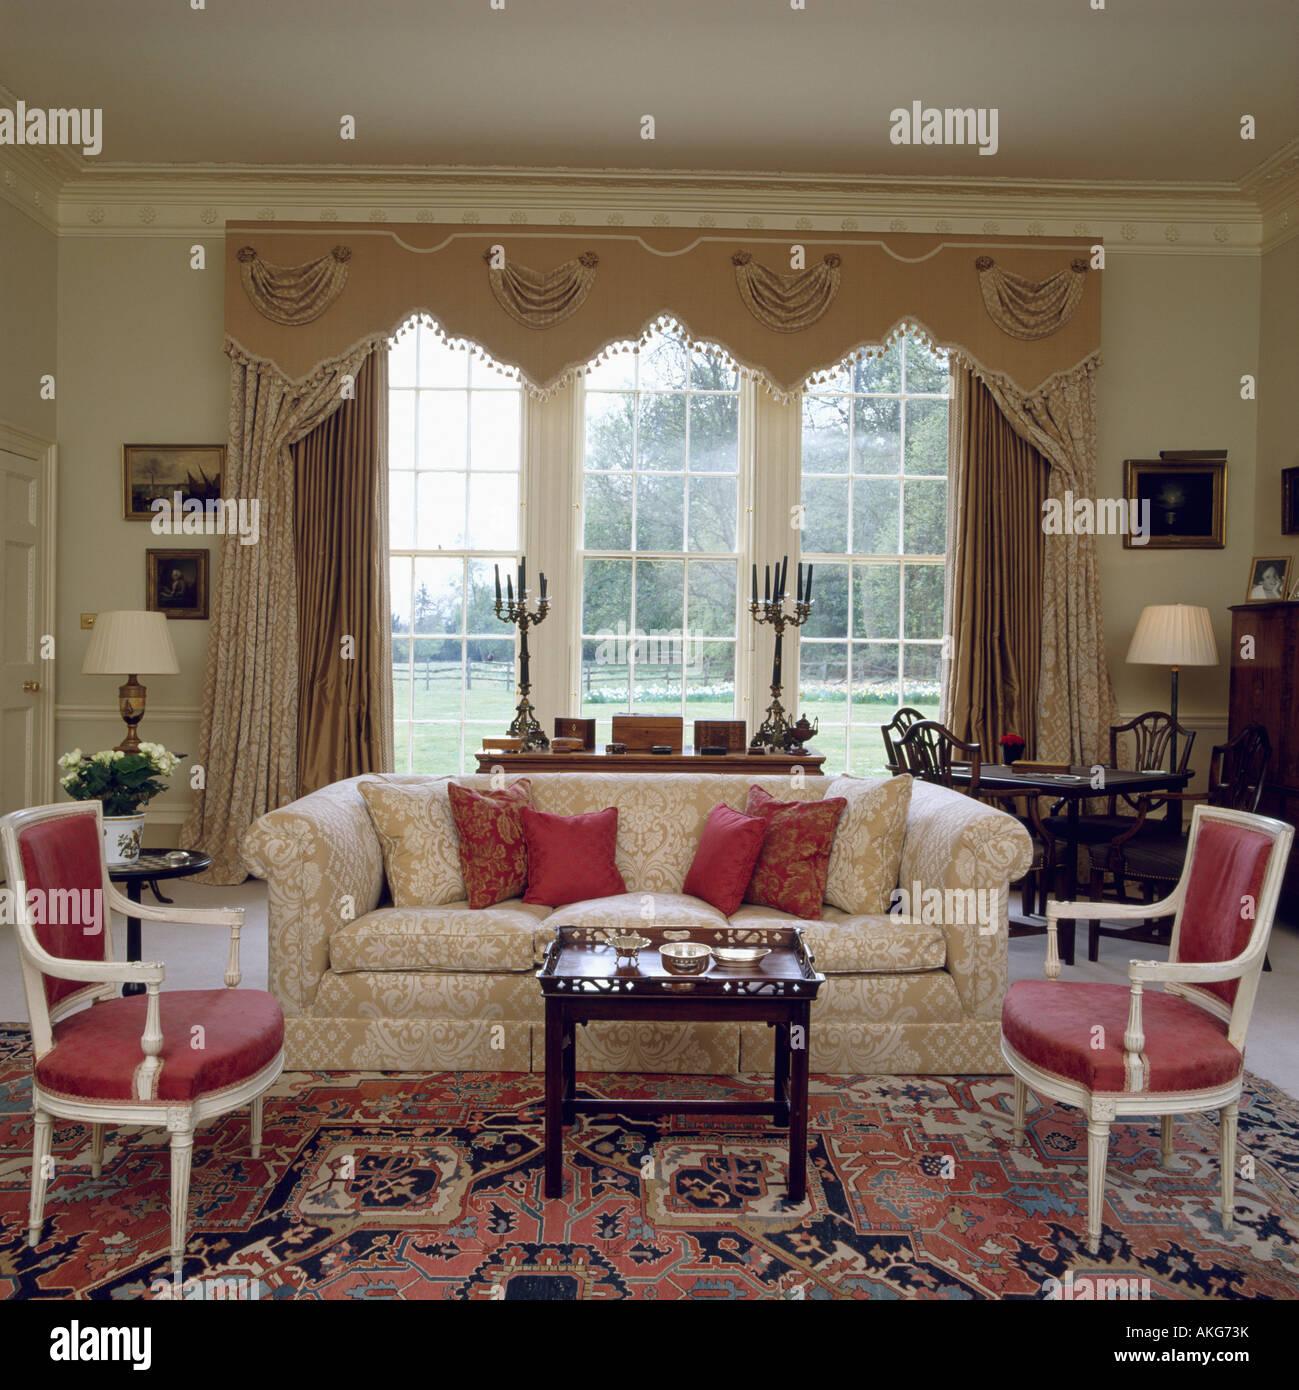 Cream Sofa In Front Of Window With Ornate Pelmet And Cream